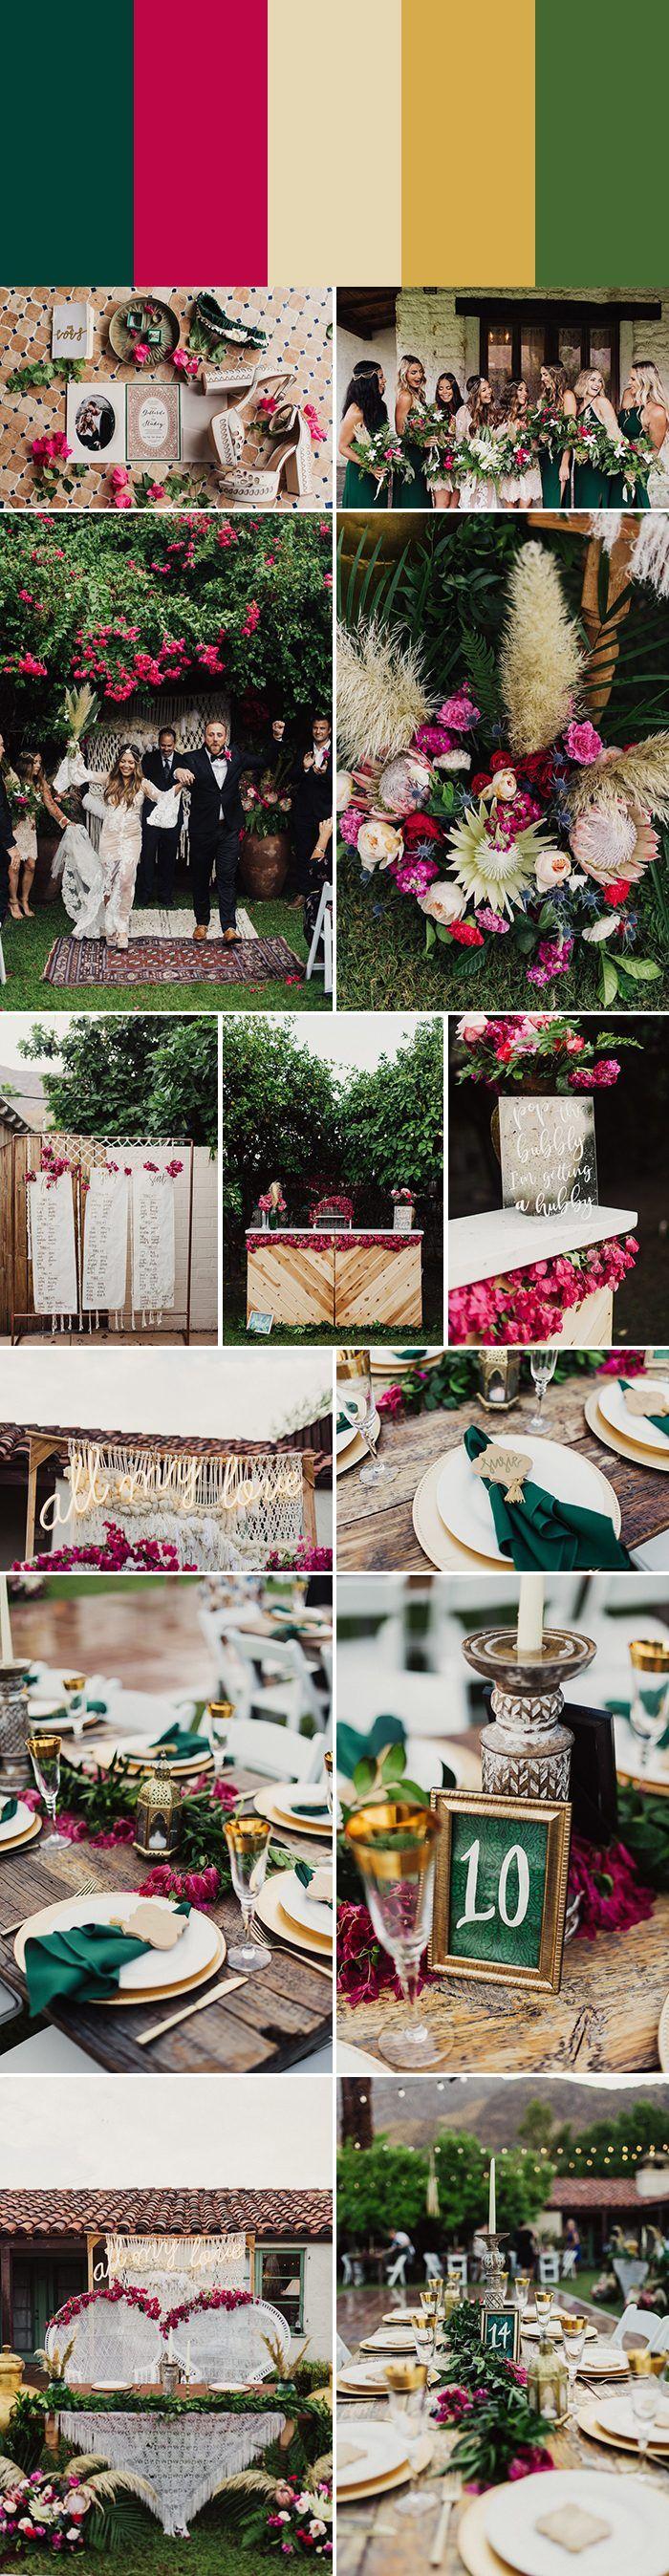 Wedding reception wedding decorations 2018 november 2018  Wedding Color Palette Inspiration  W Life  Pinterest  Boda